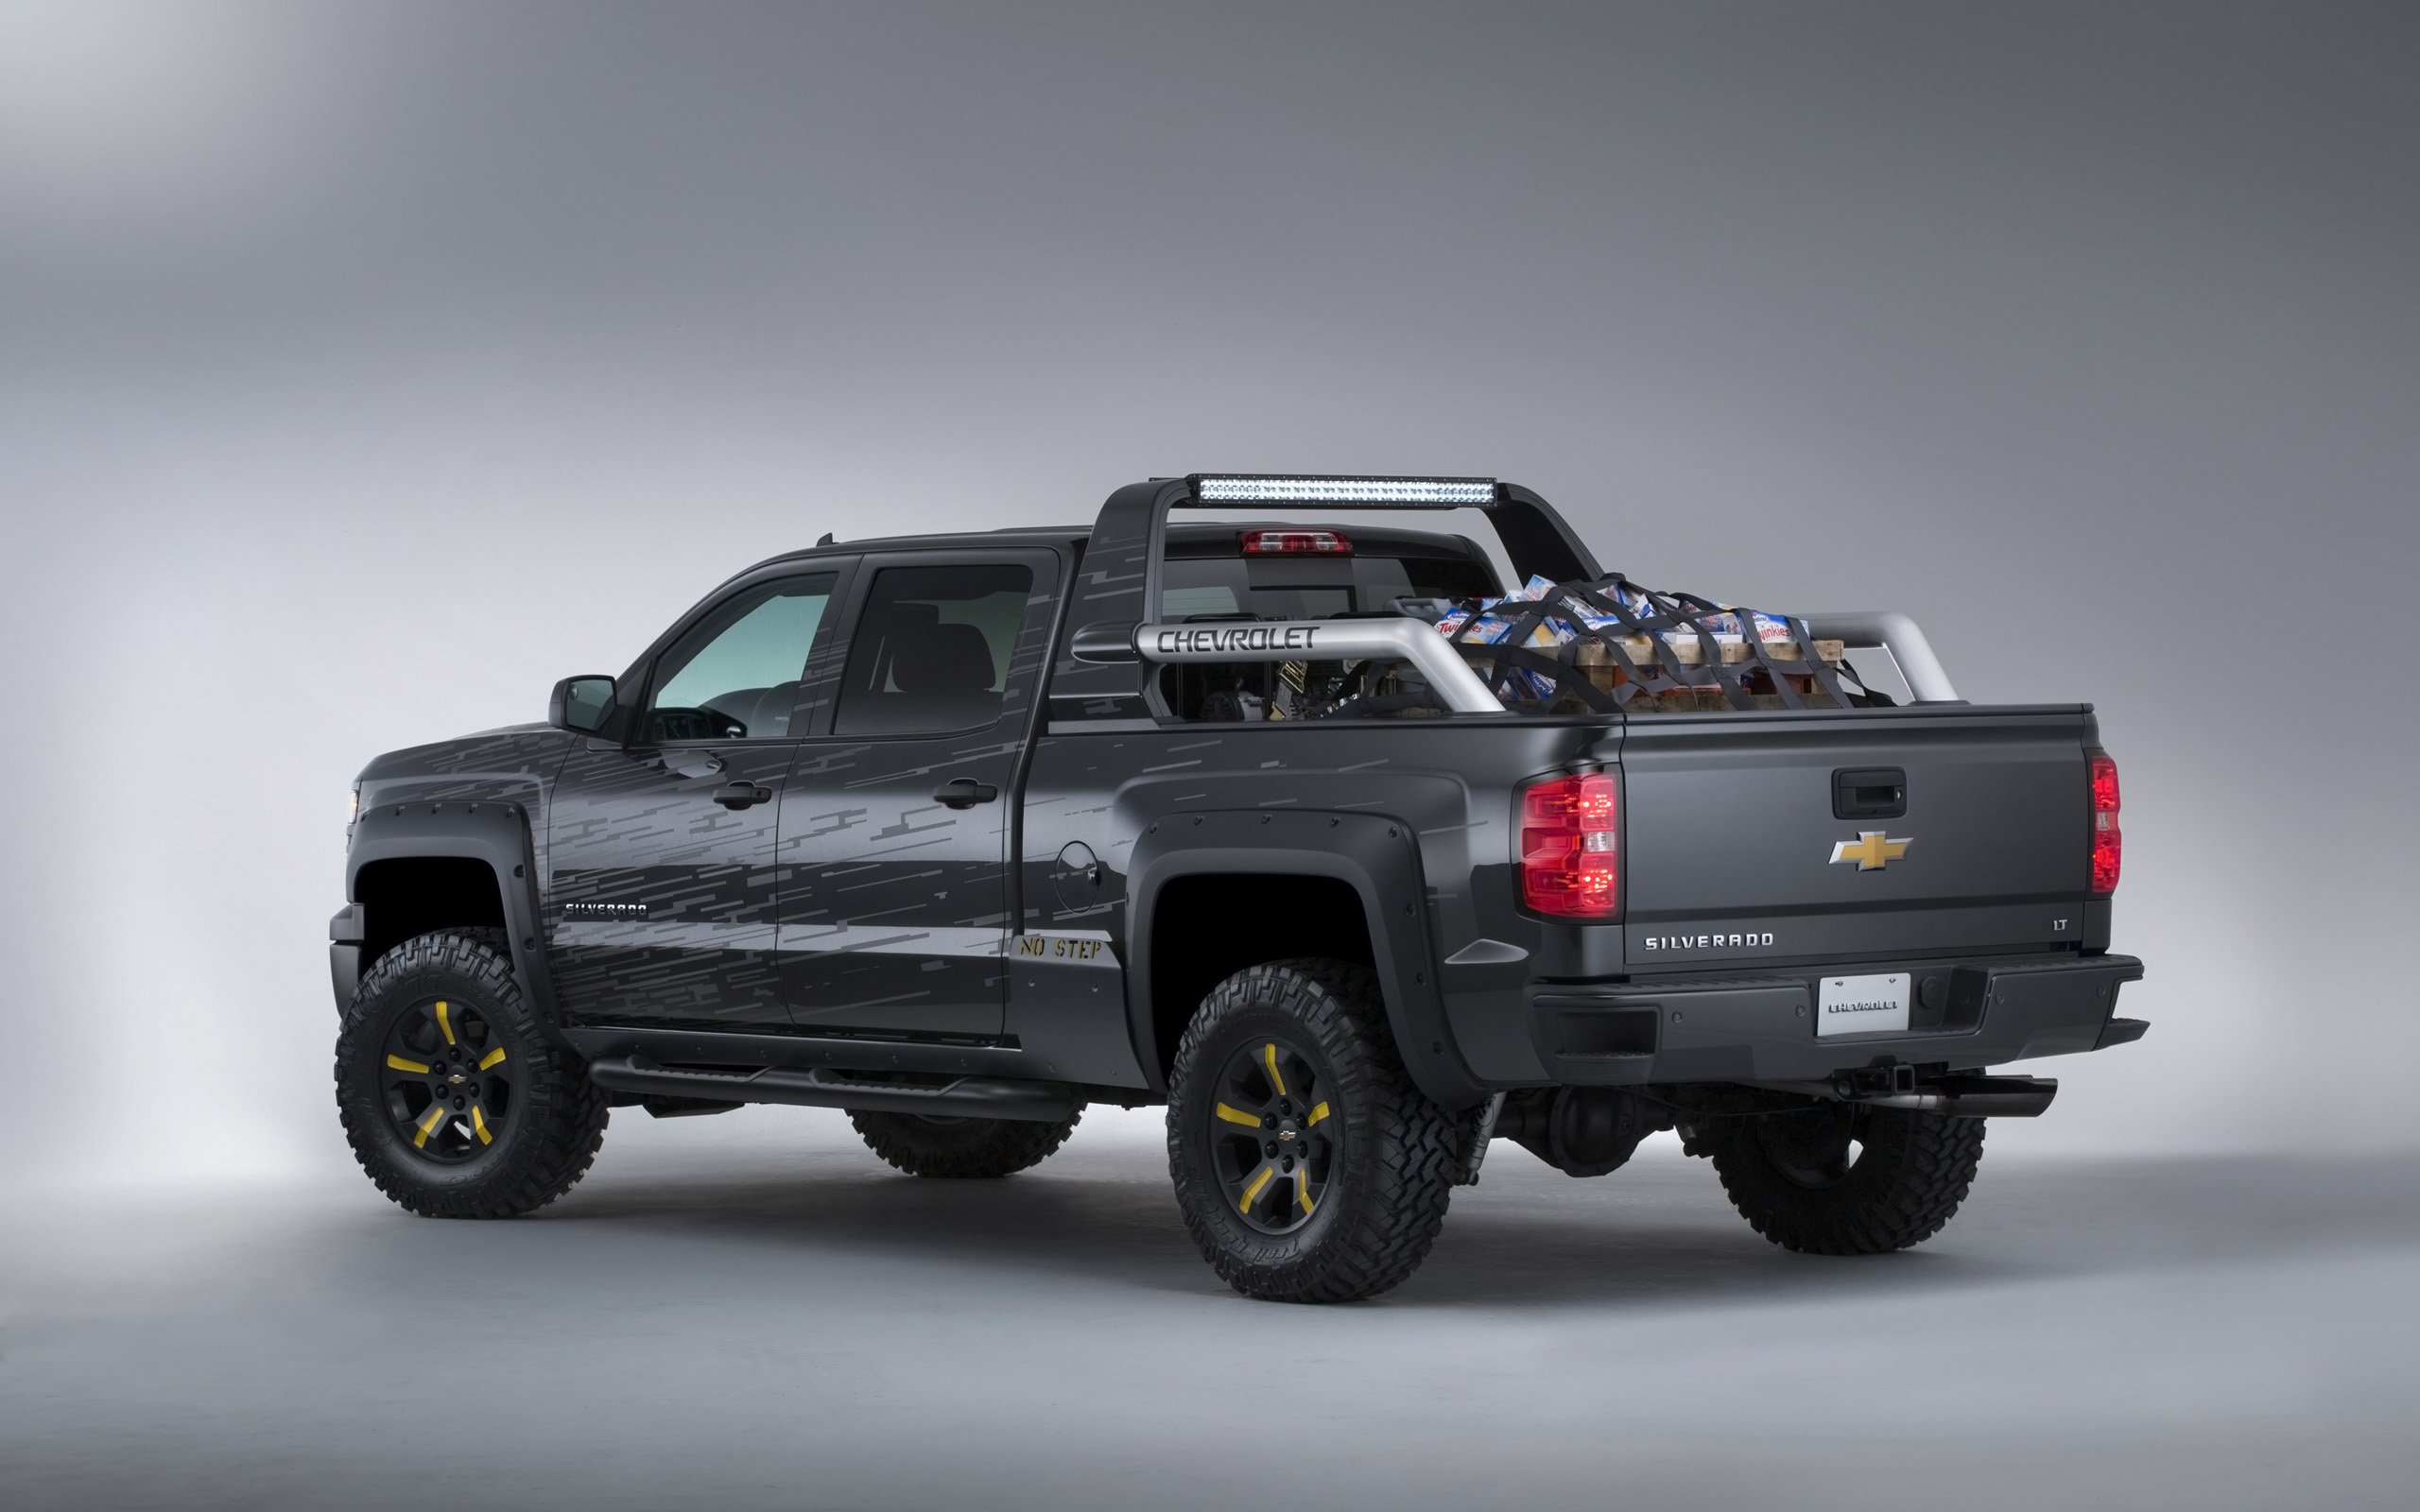 2013 chevrolet silverado black ops concept 4x4 pickup wallpaper